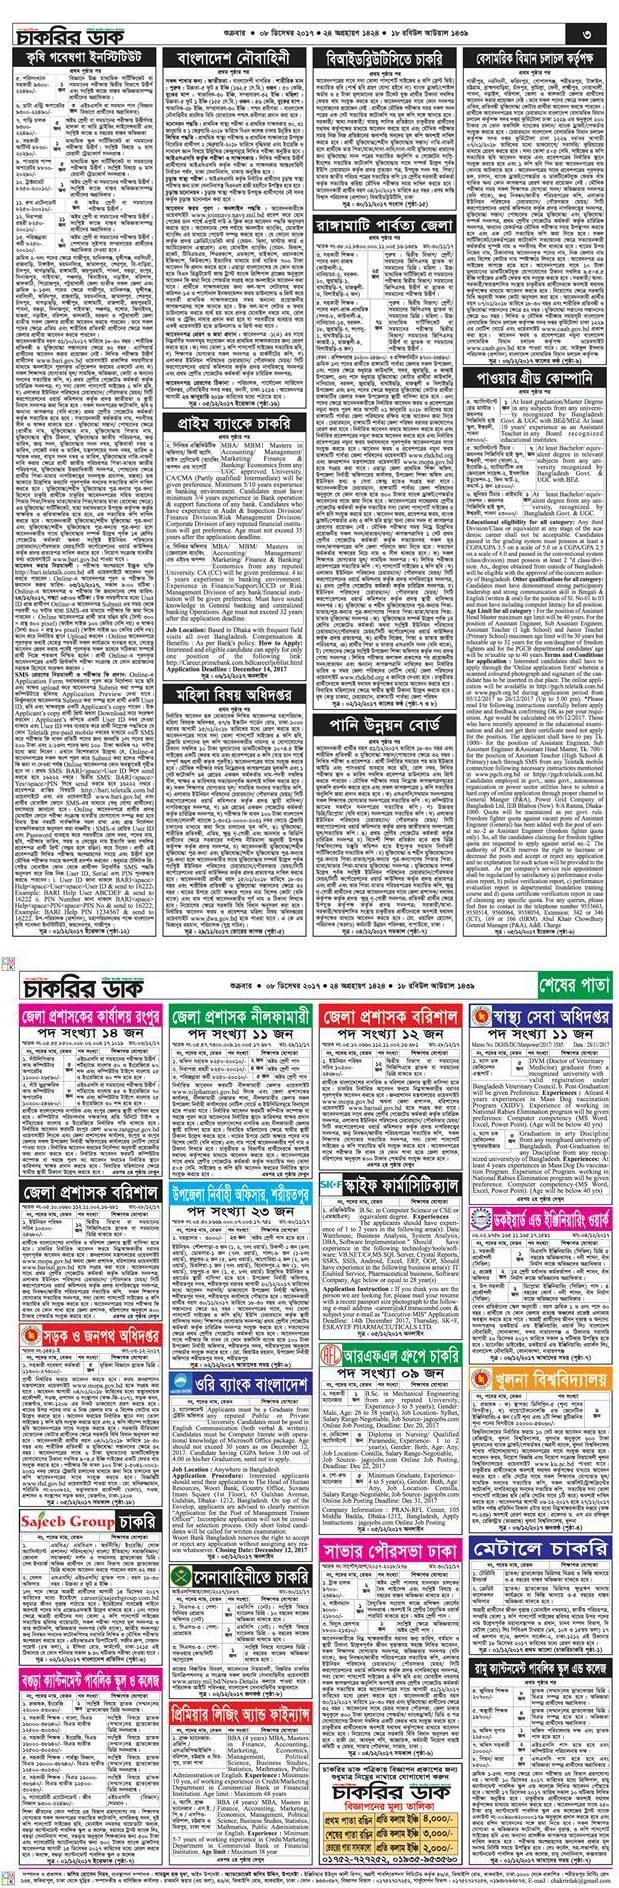 Chakrir Dak Weekly Job Newspaper